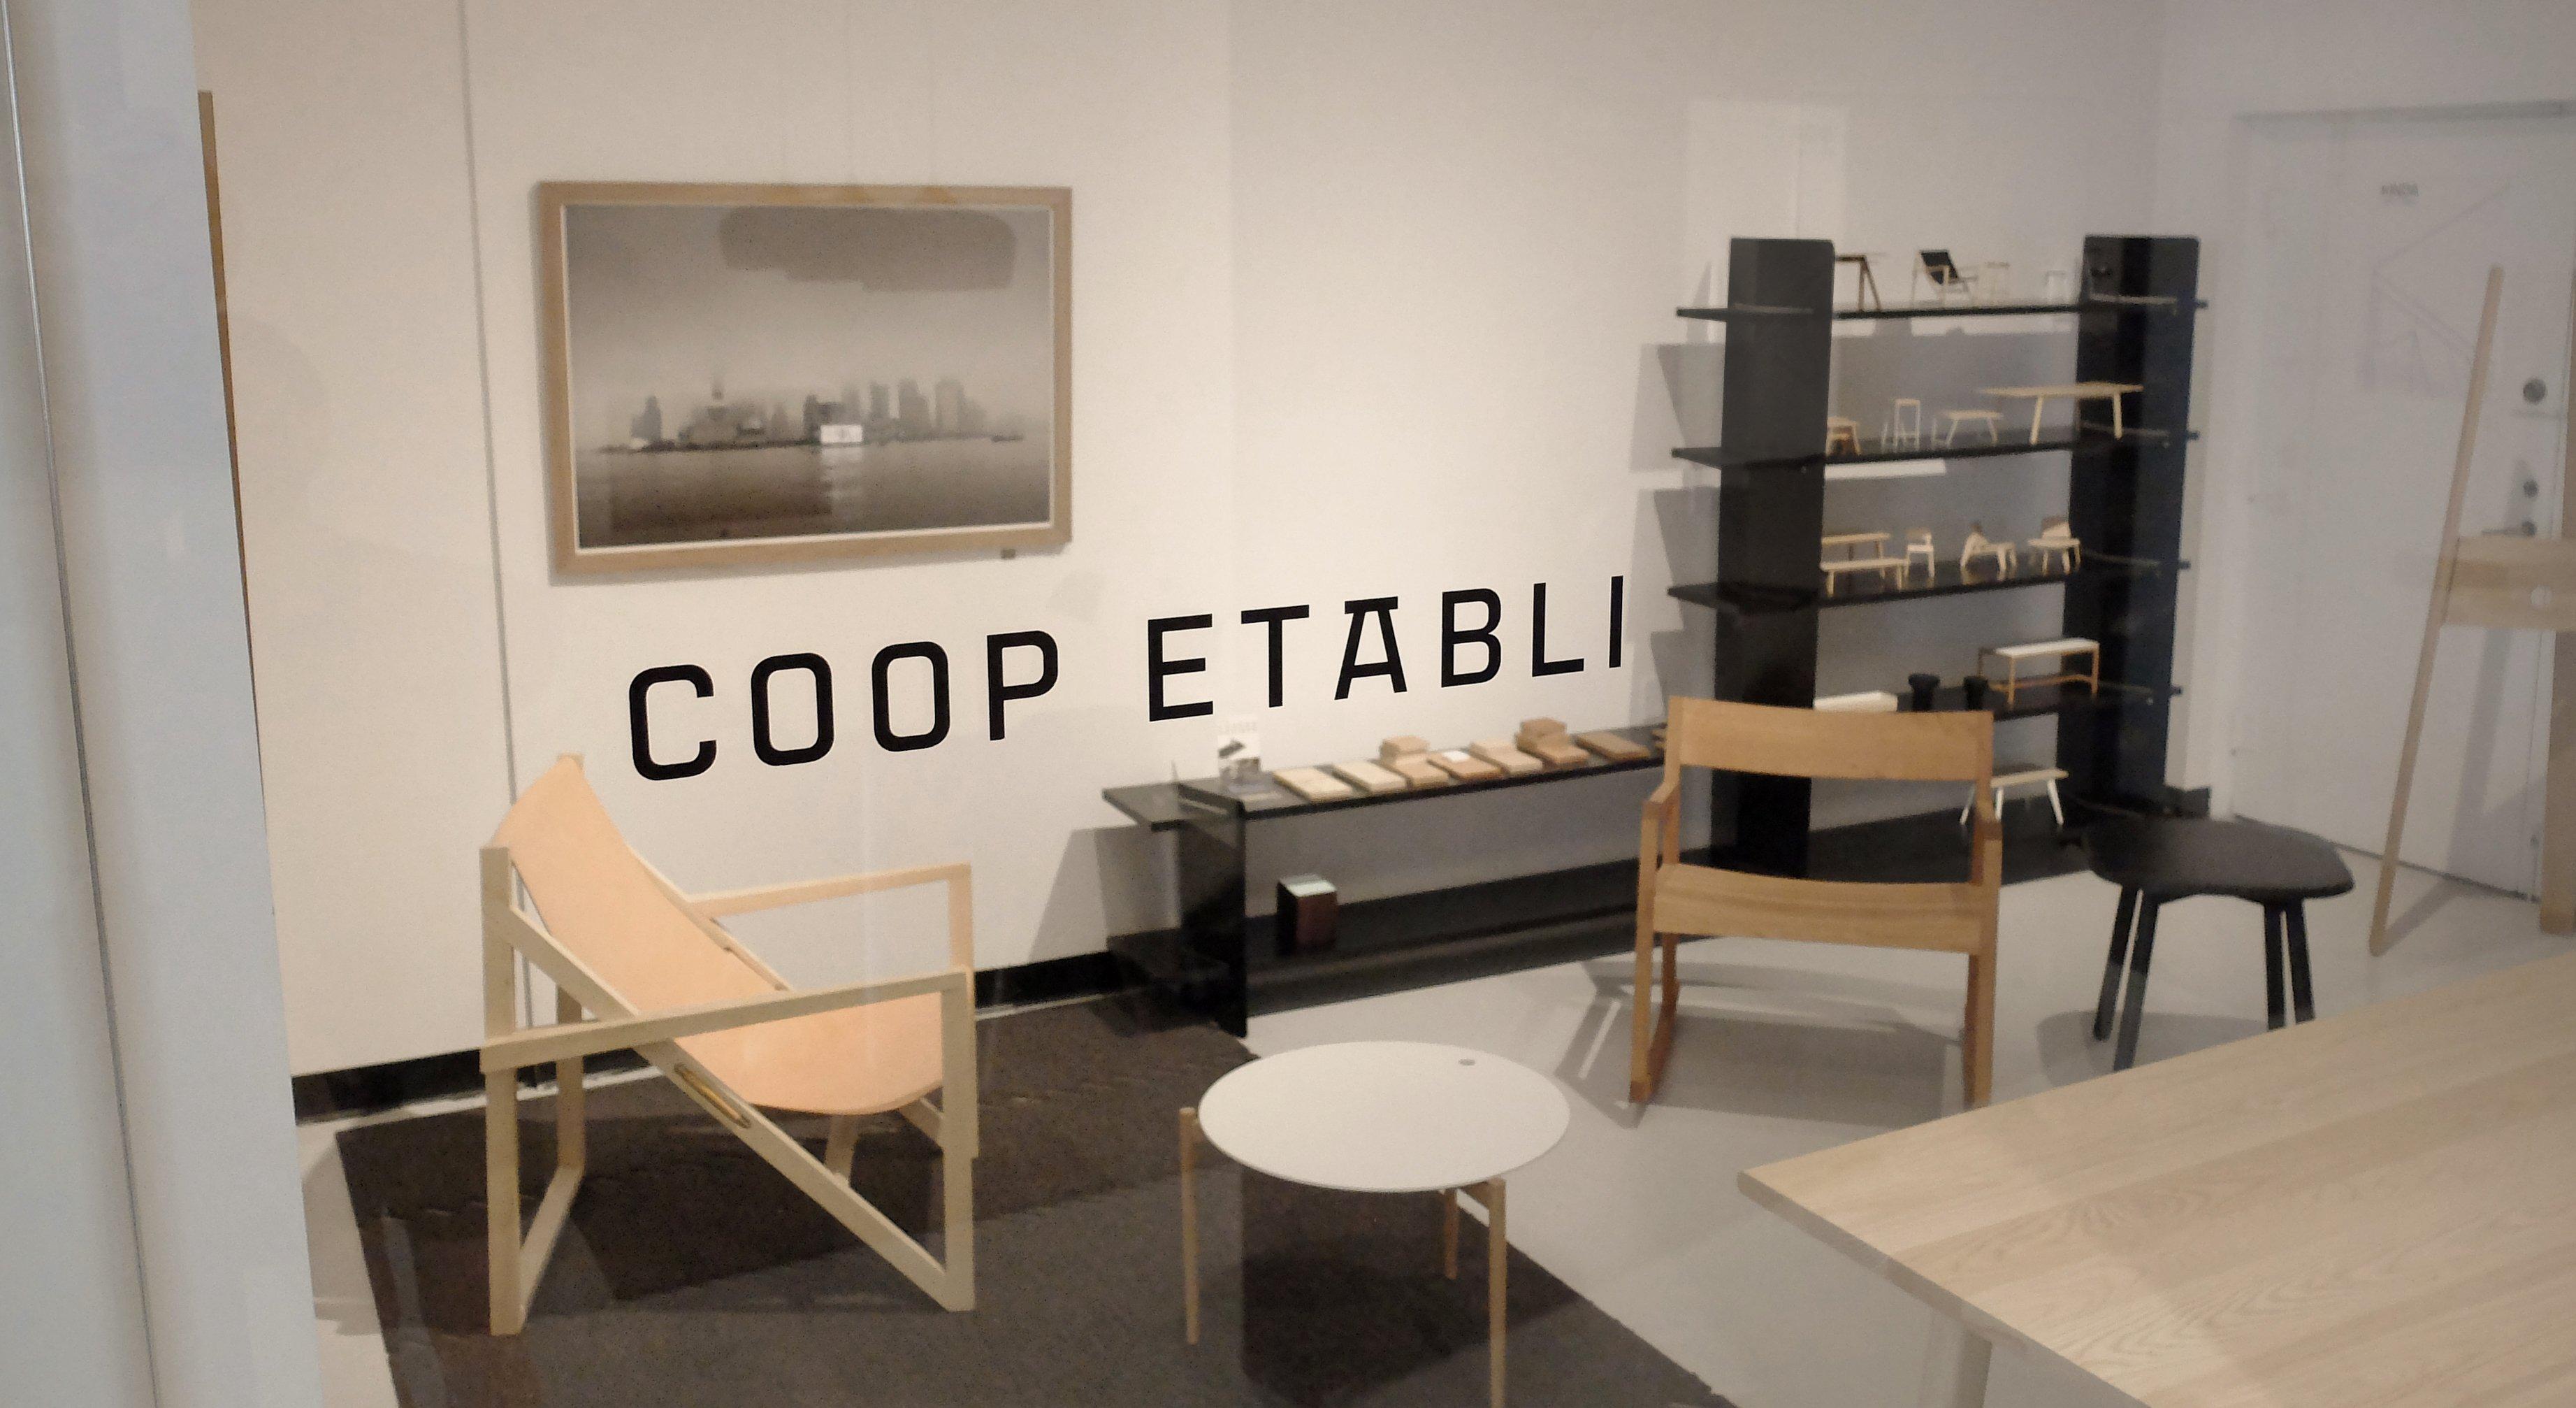 coop-etabli